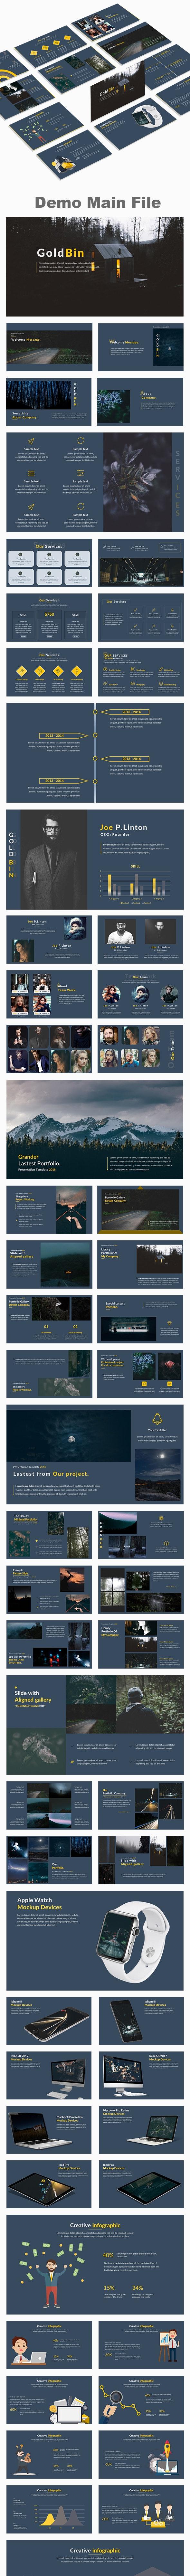 Goldbin Multipurpose PowerPoint Template - Creative PowerPoint Templates